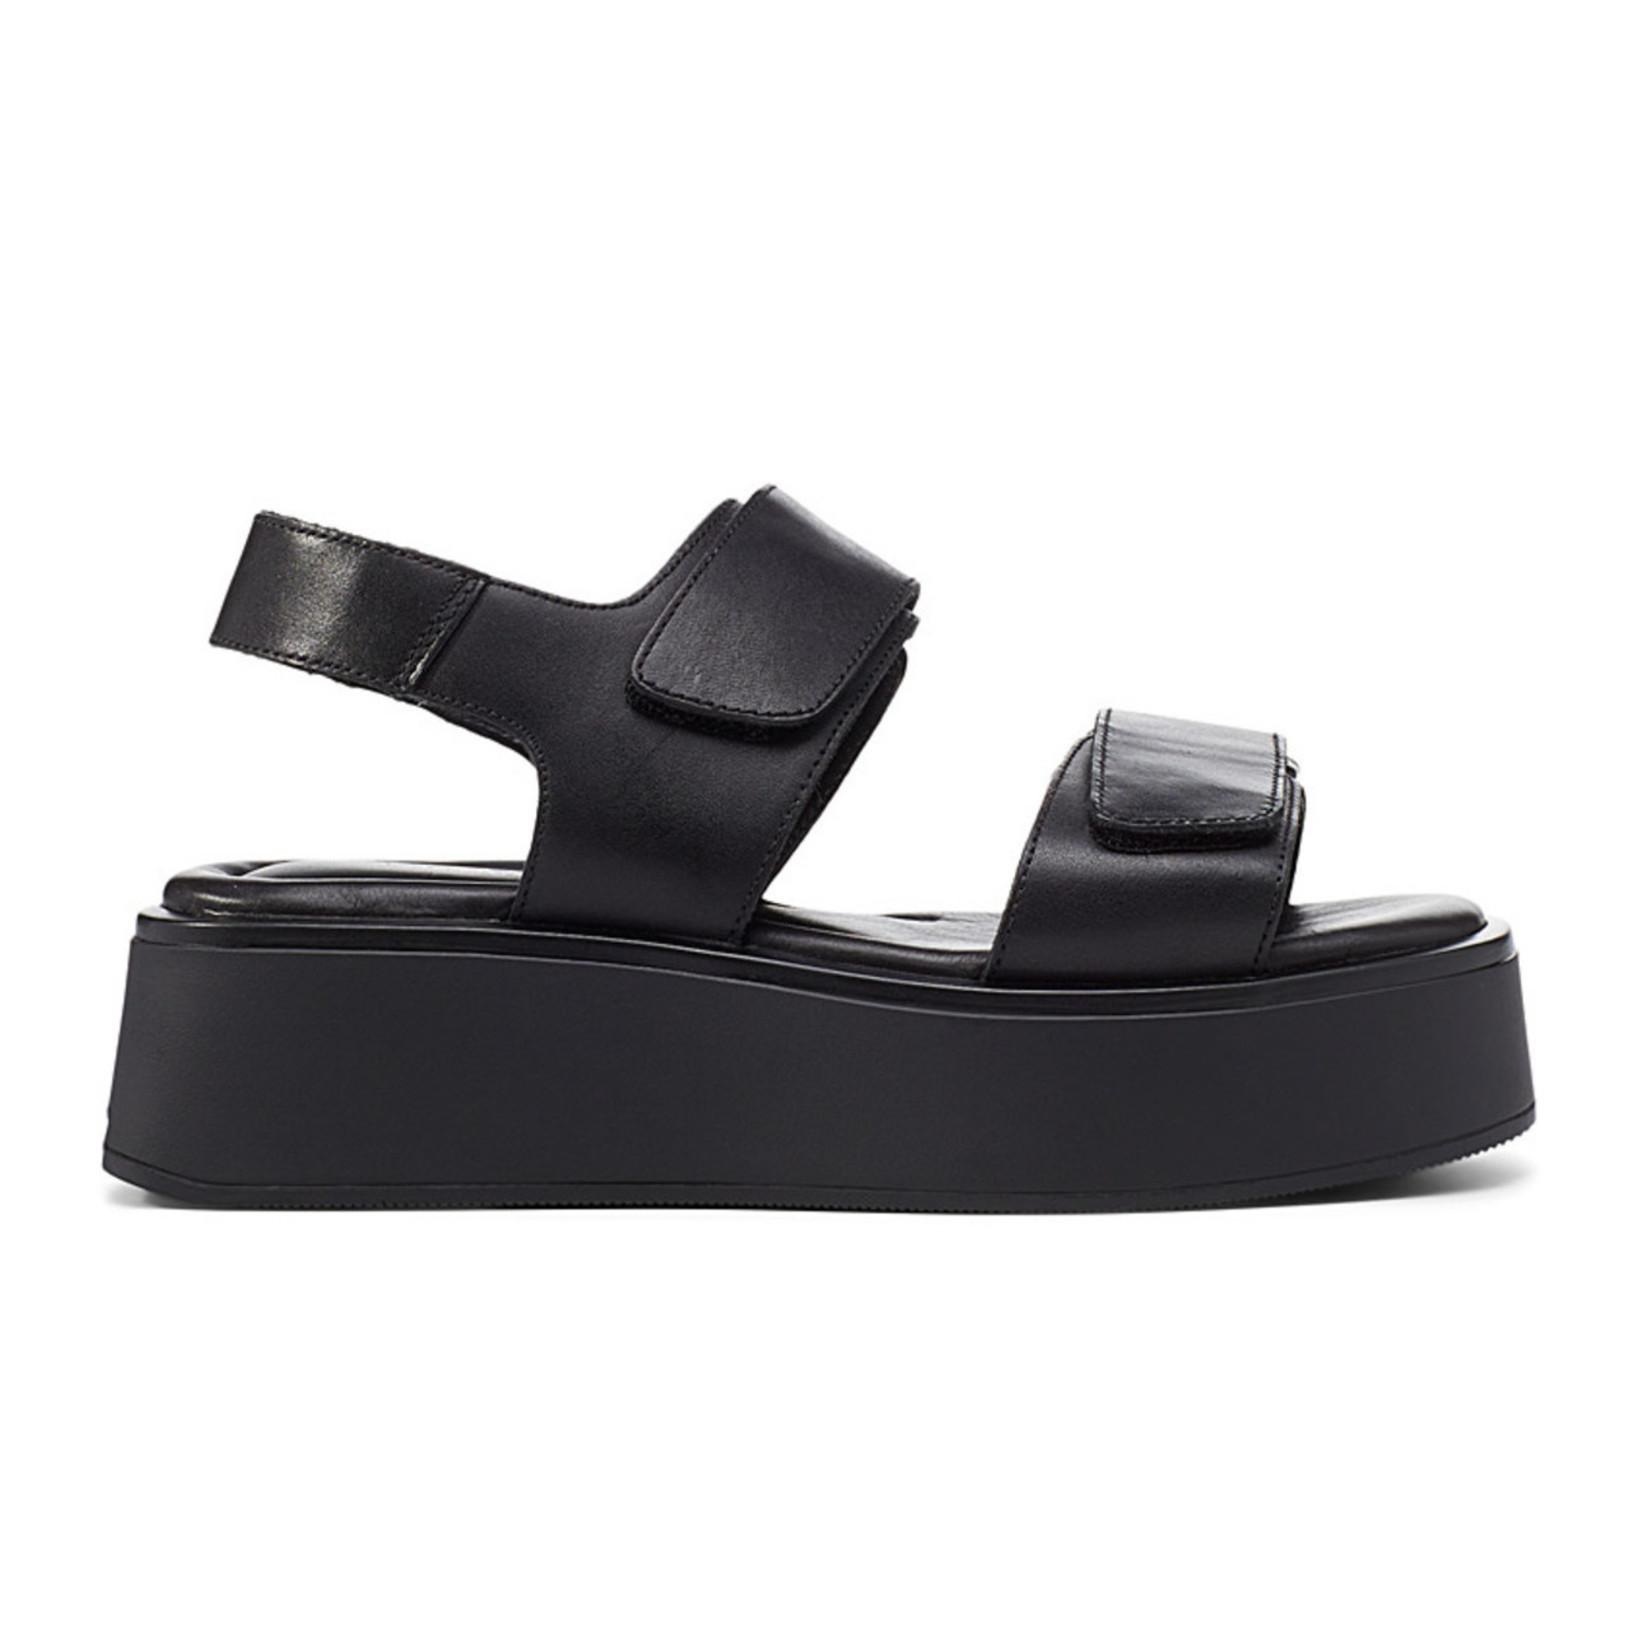 Vagabond Courtney Platform Sandal Black